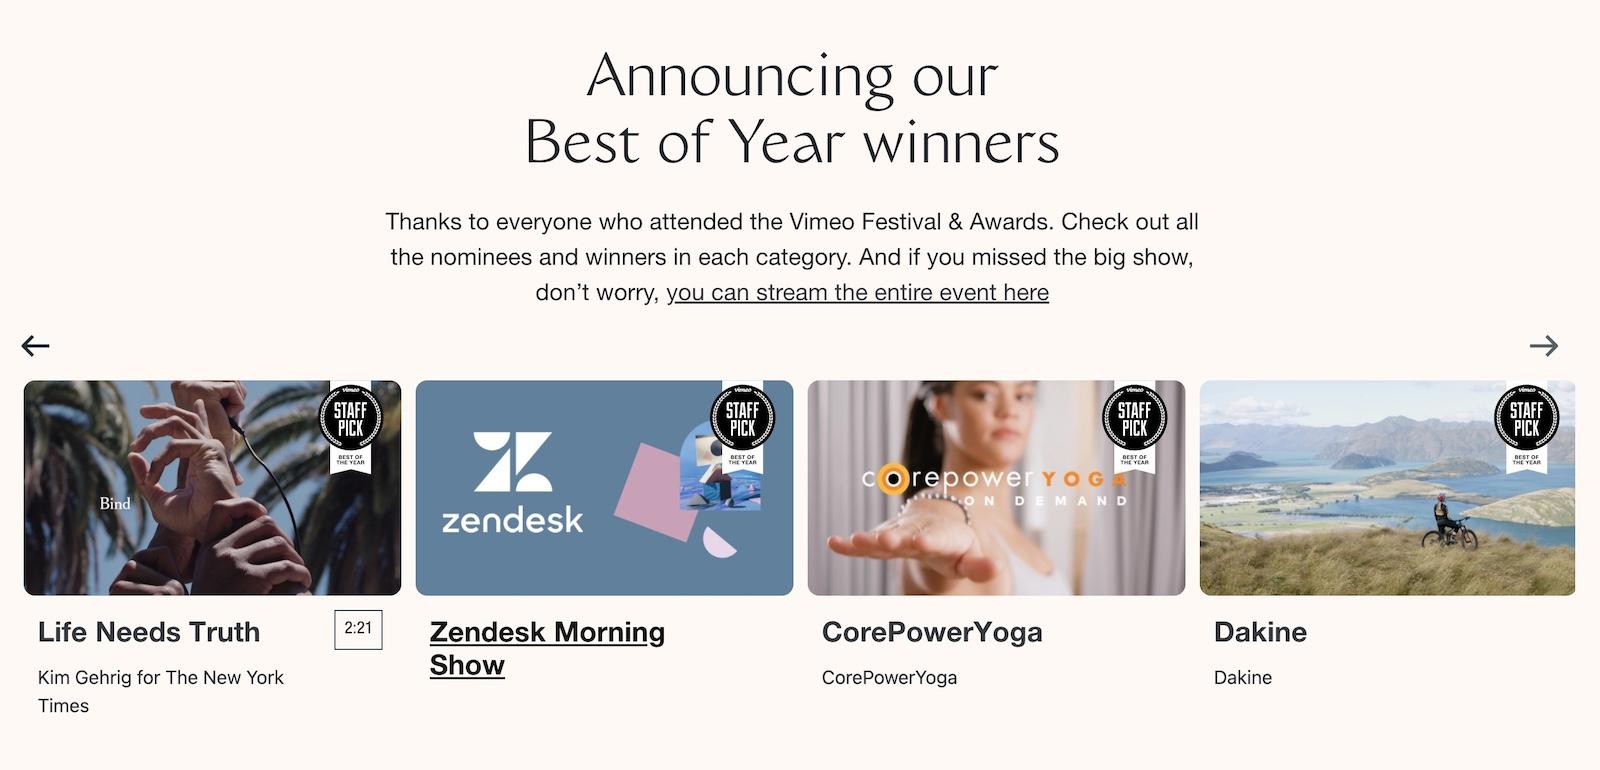 Vimeo Festival & Awards 2020 Best of the Year winners